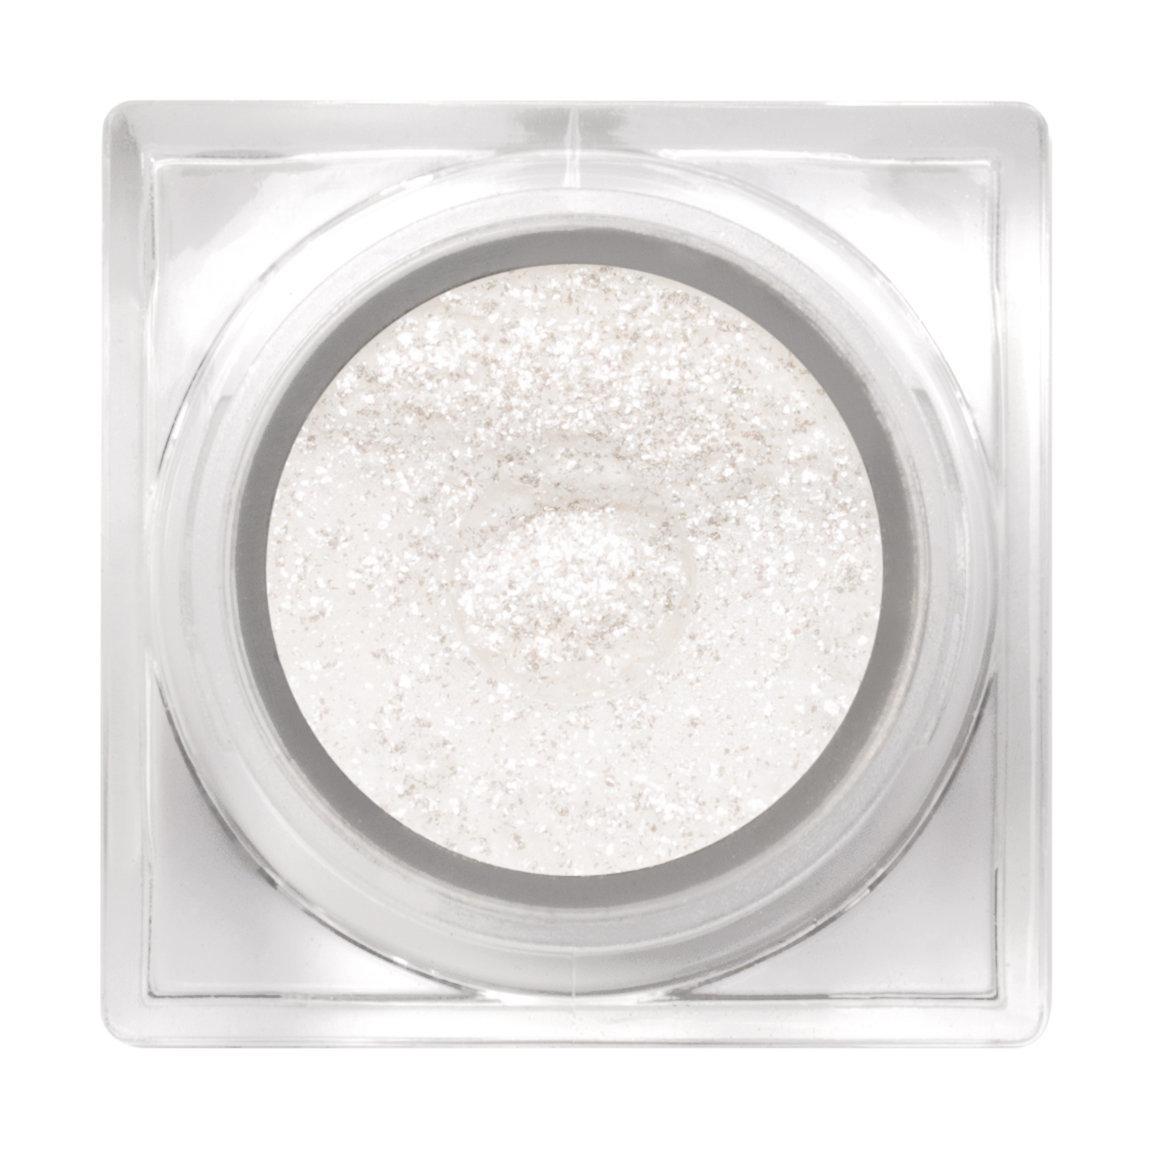 Lit Cosmetics Lit Metals Luminous (Silver) alternative view 1 - product swatch.